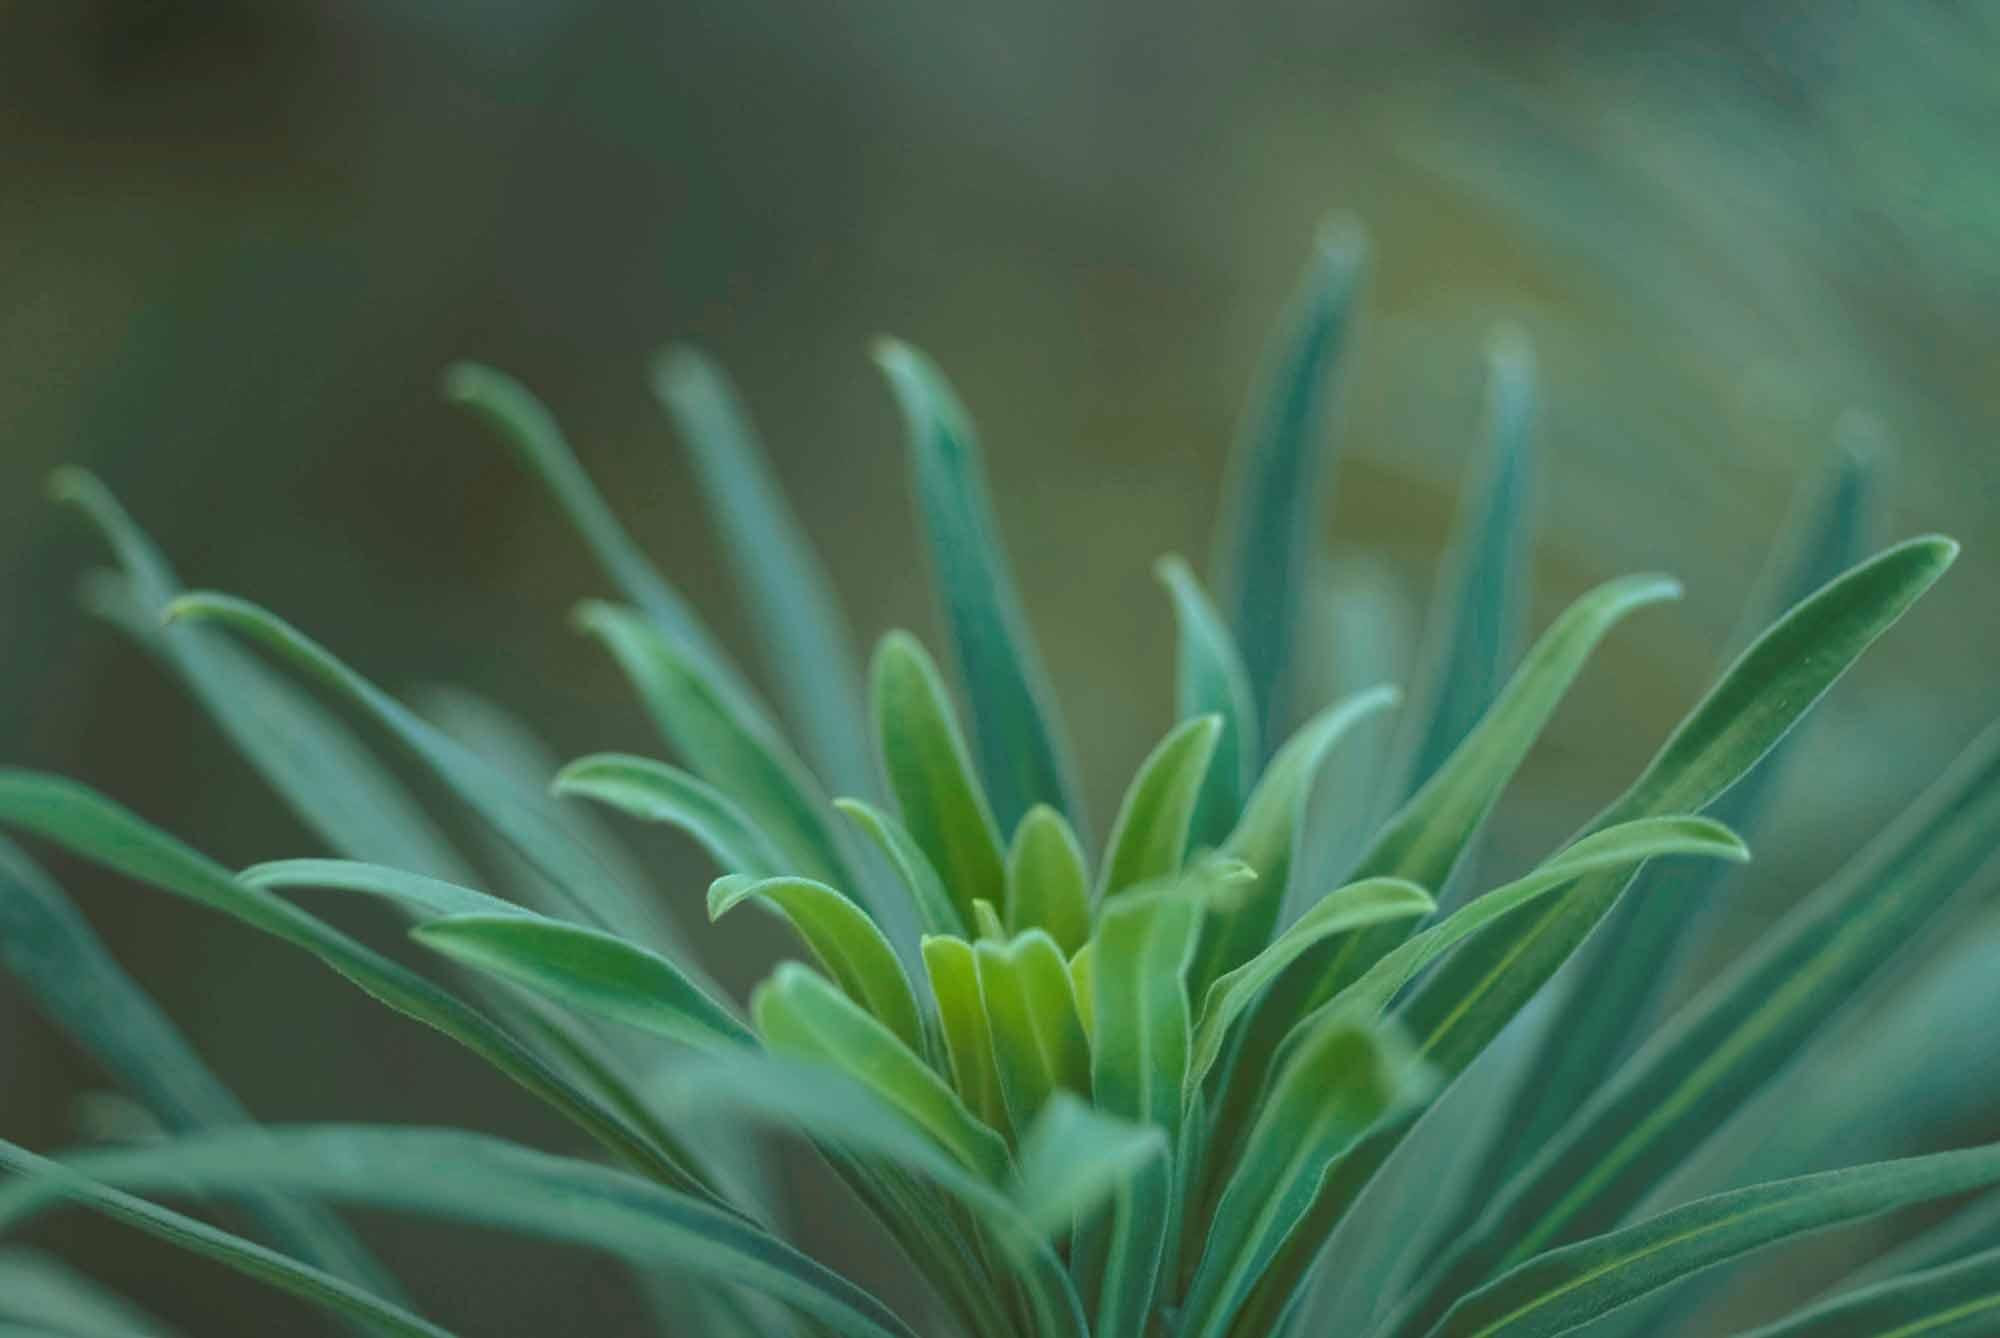 abri-lilin-hally-kirsten-mcateer-portland-psychotherapy-rodbt-4